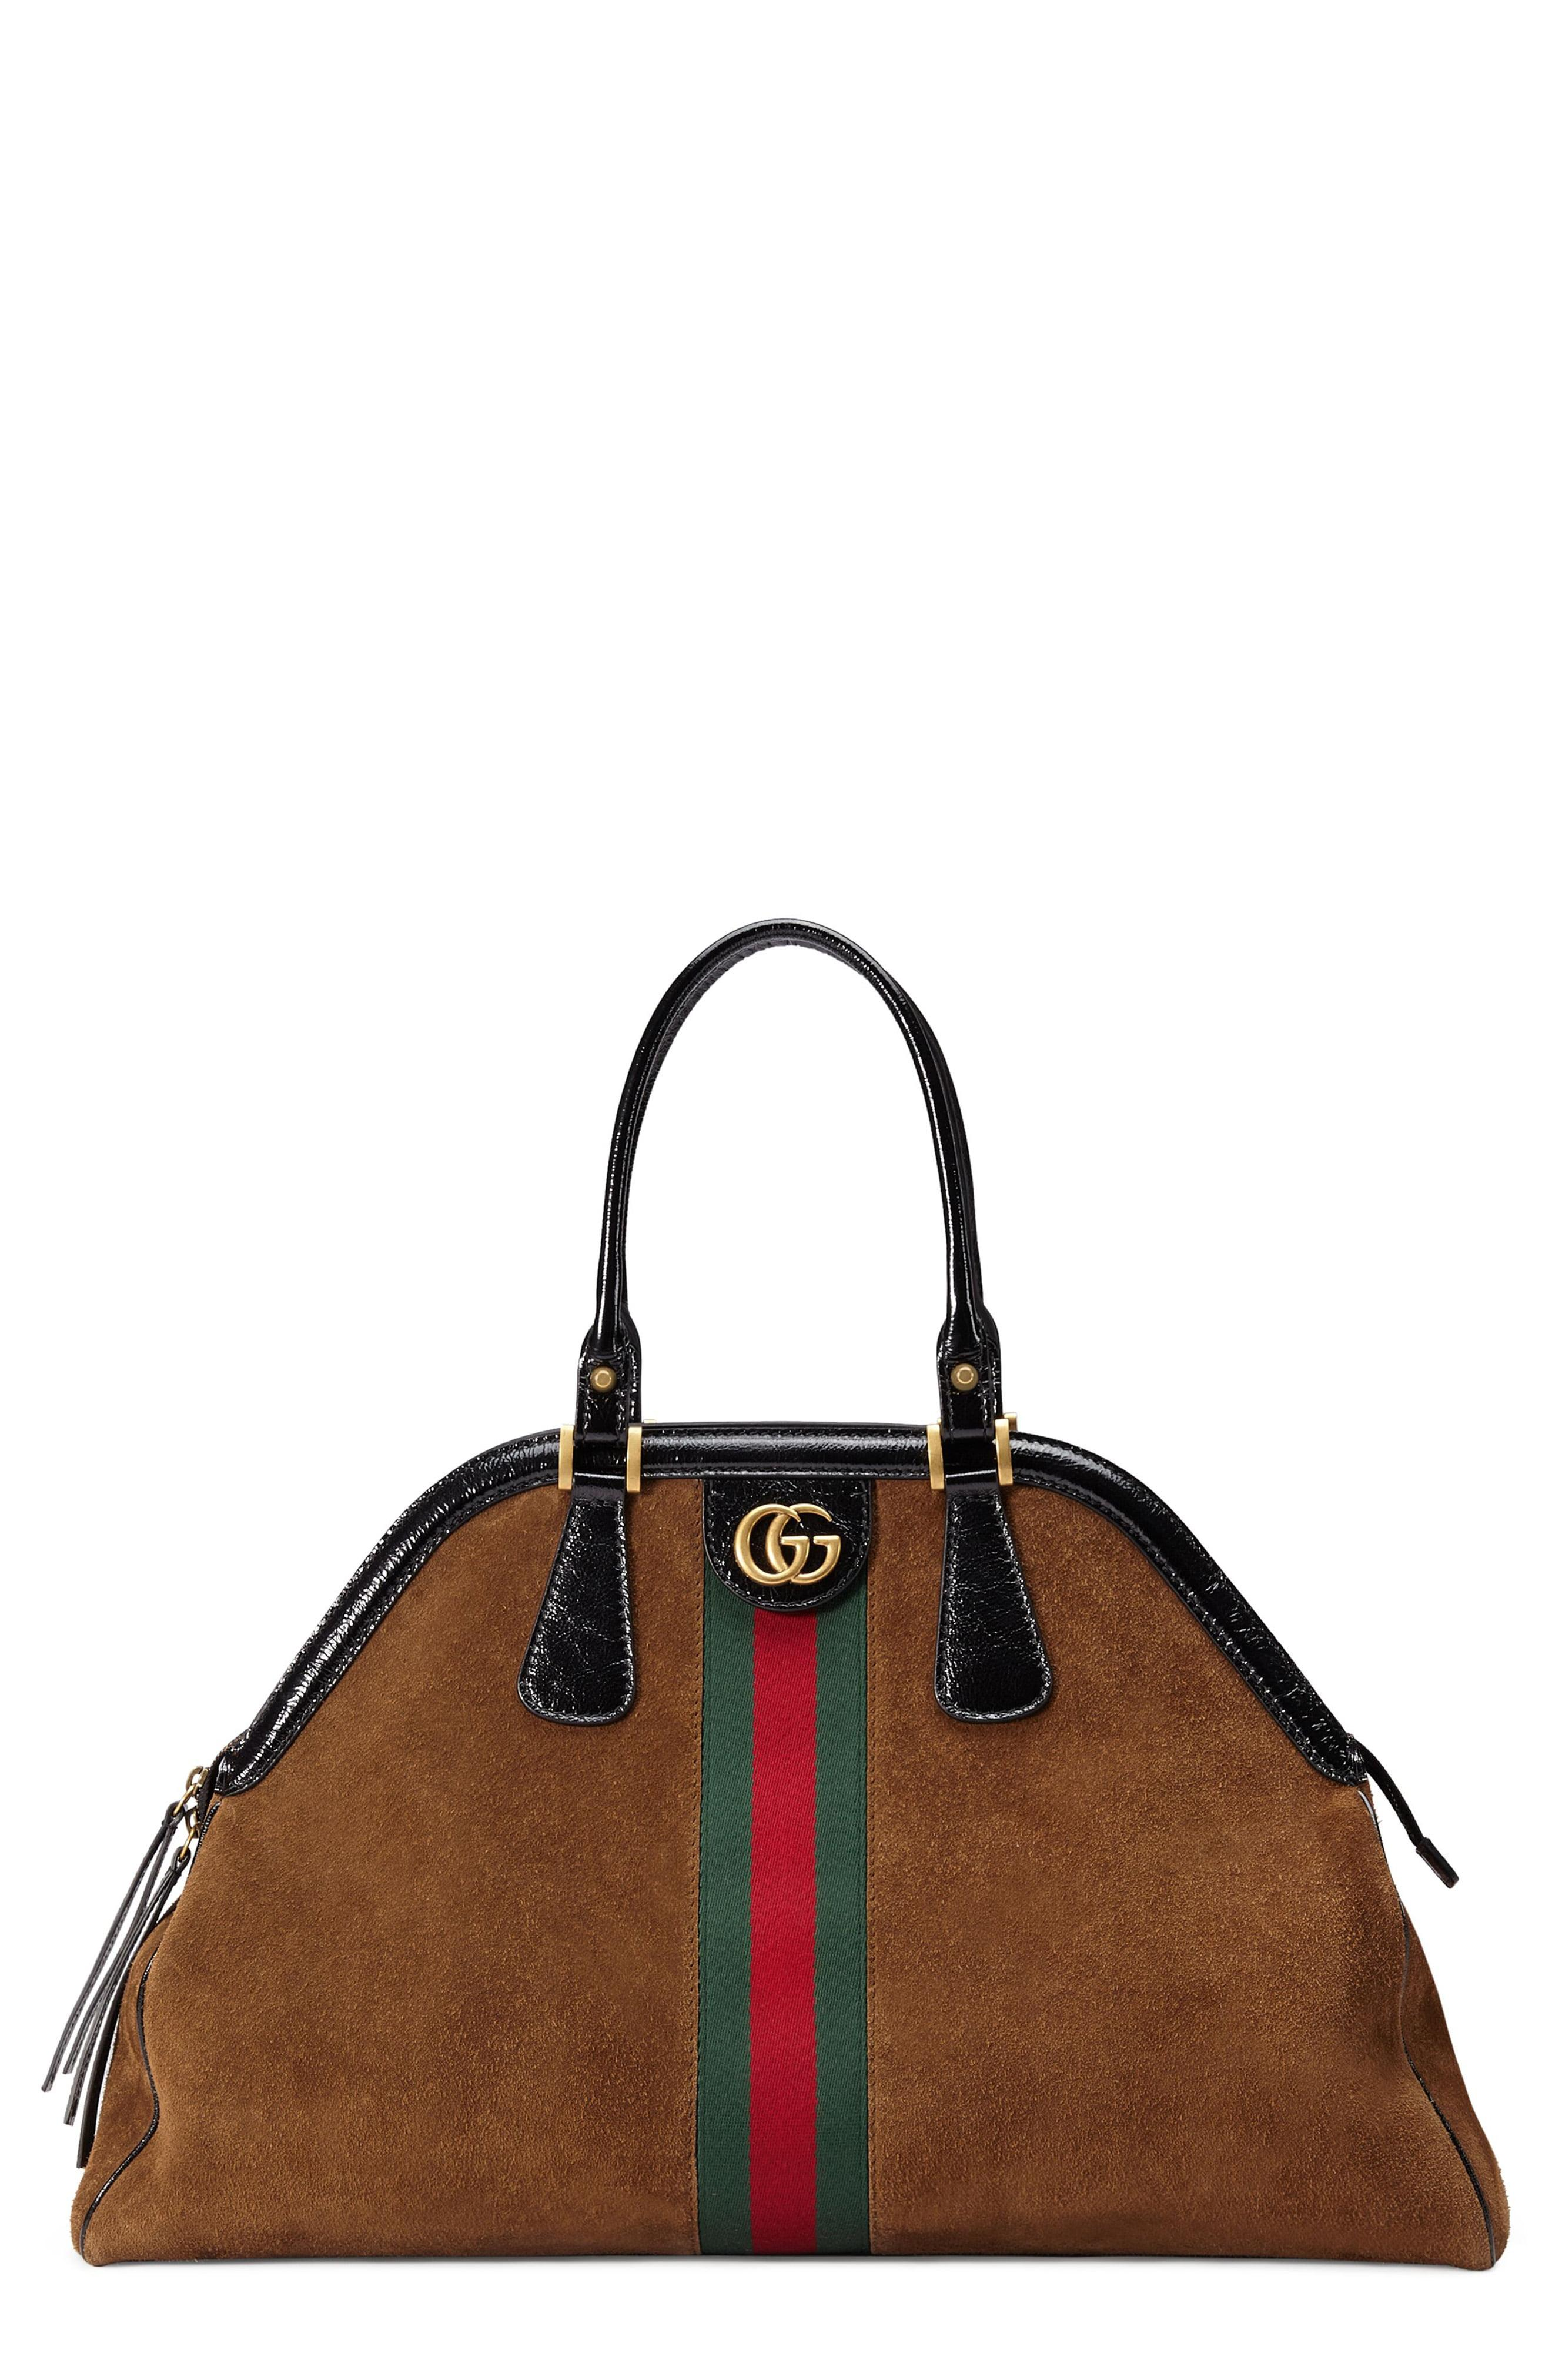 832985318d6 Lyst - Gucci Women s Borsa Linea Medium Top Handle Leather Tote ...